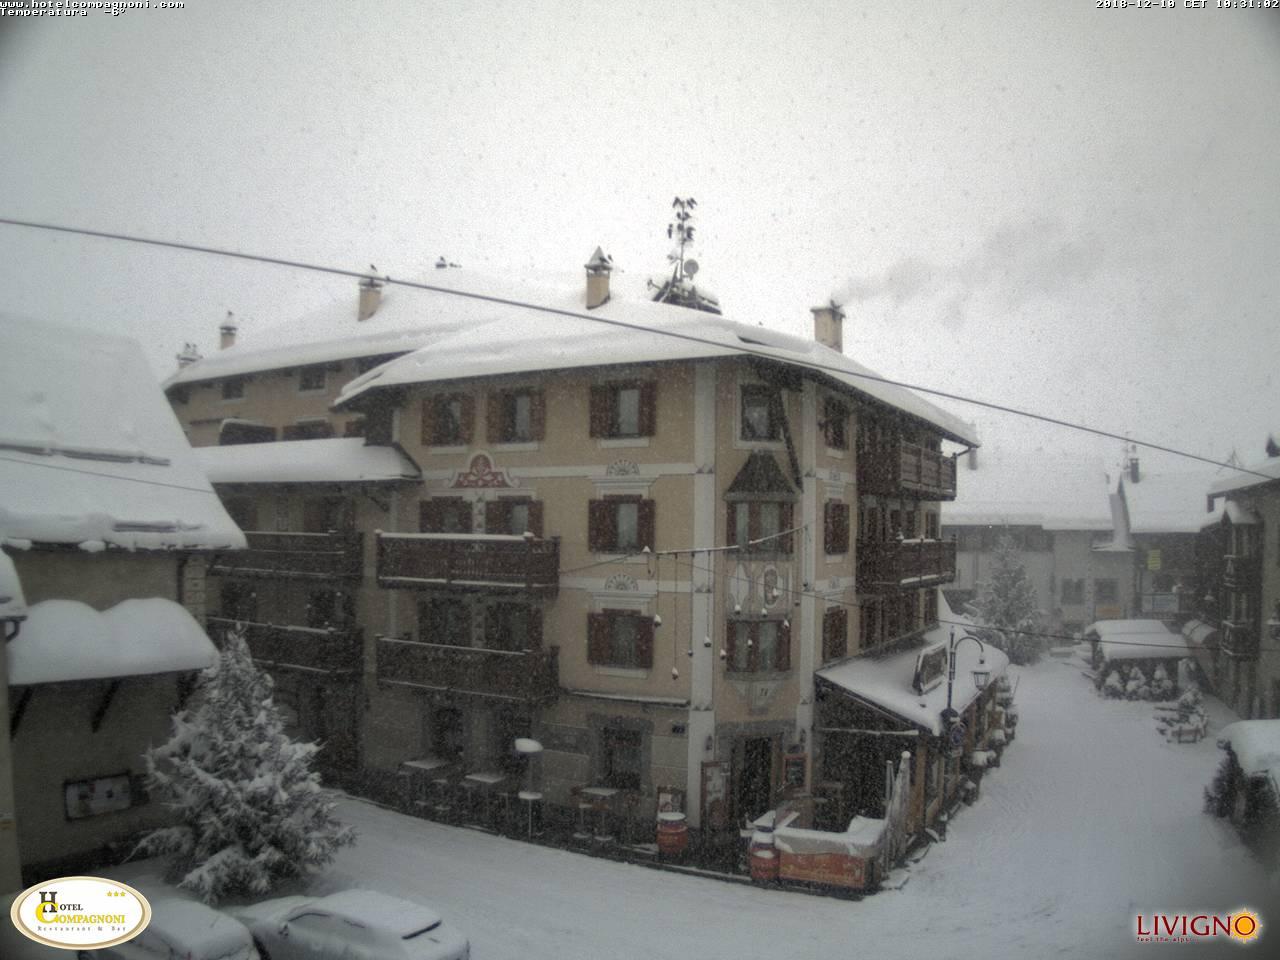 Nowcasting Valtellina, Valchiavenna, Orobie e Lario: INVERNO 2018-19-webcam-compagnoni.jpg